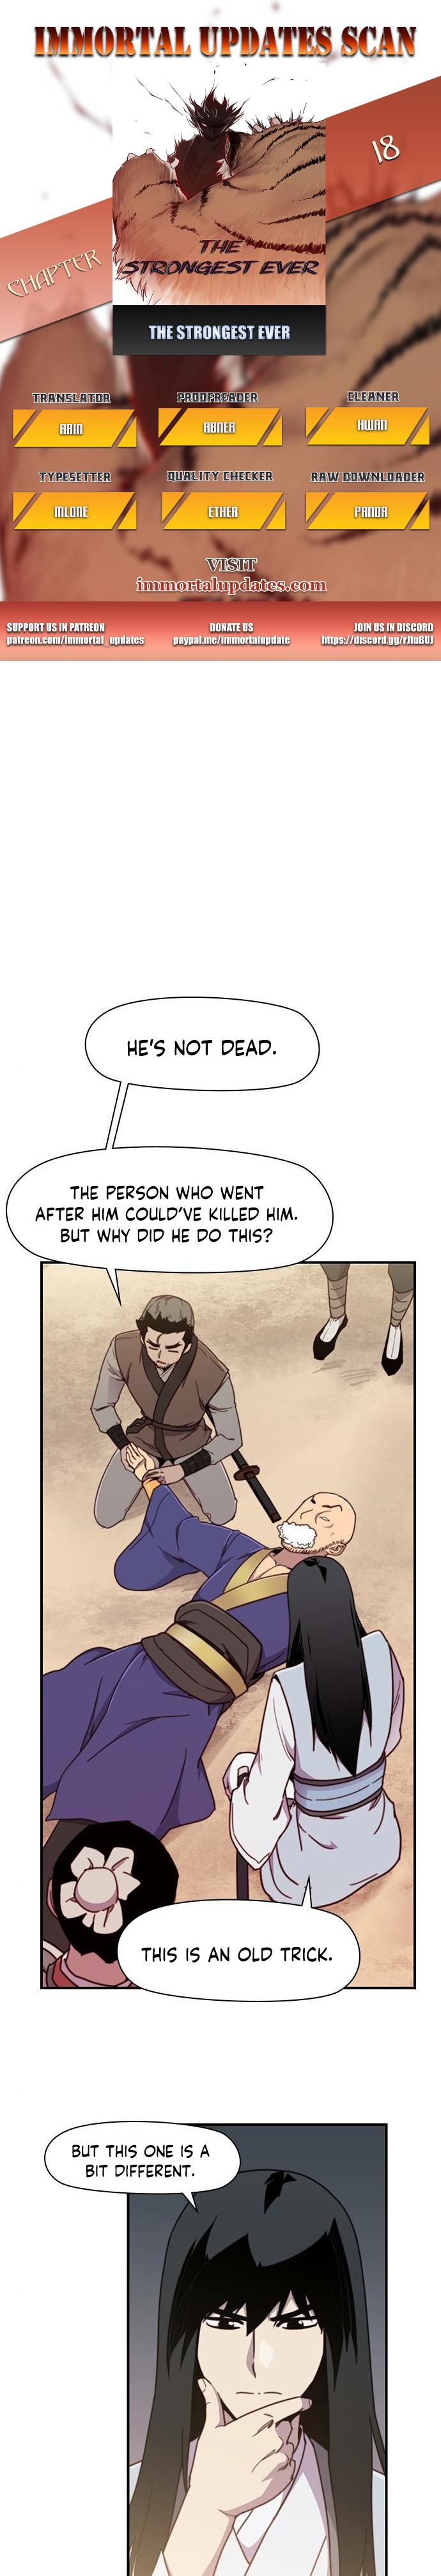 https://manga.mangadogs.com/comics/pic4/12/44428/2863704/64179b3eb67988583d803807ca305acf.jpg Page 1